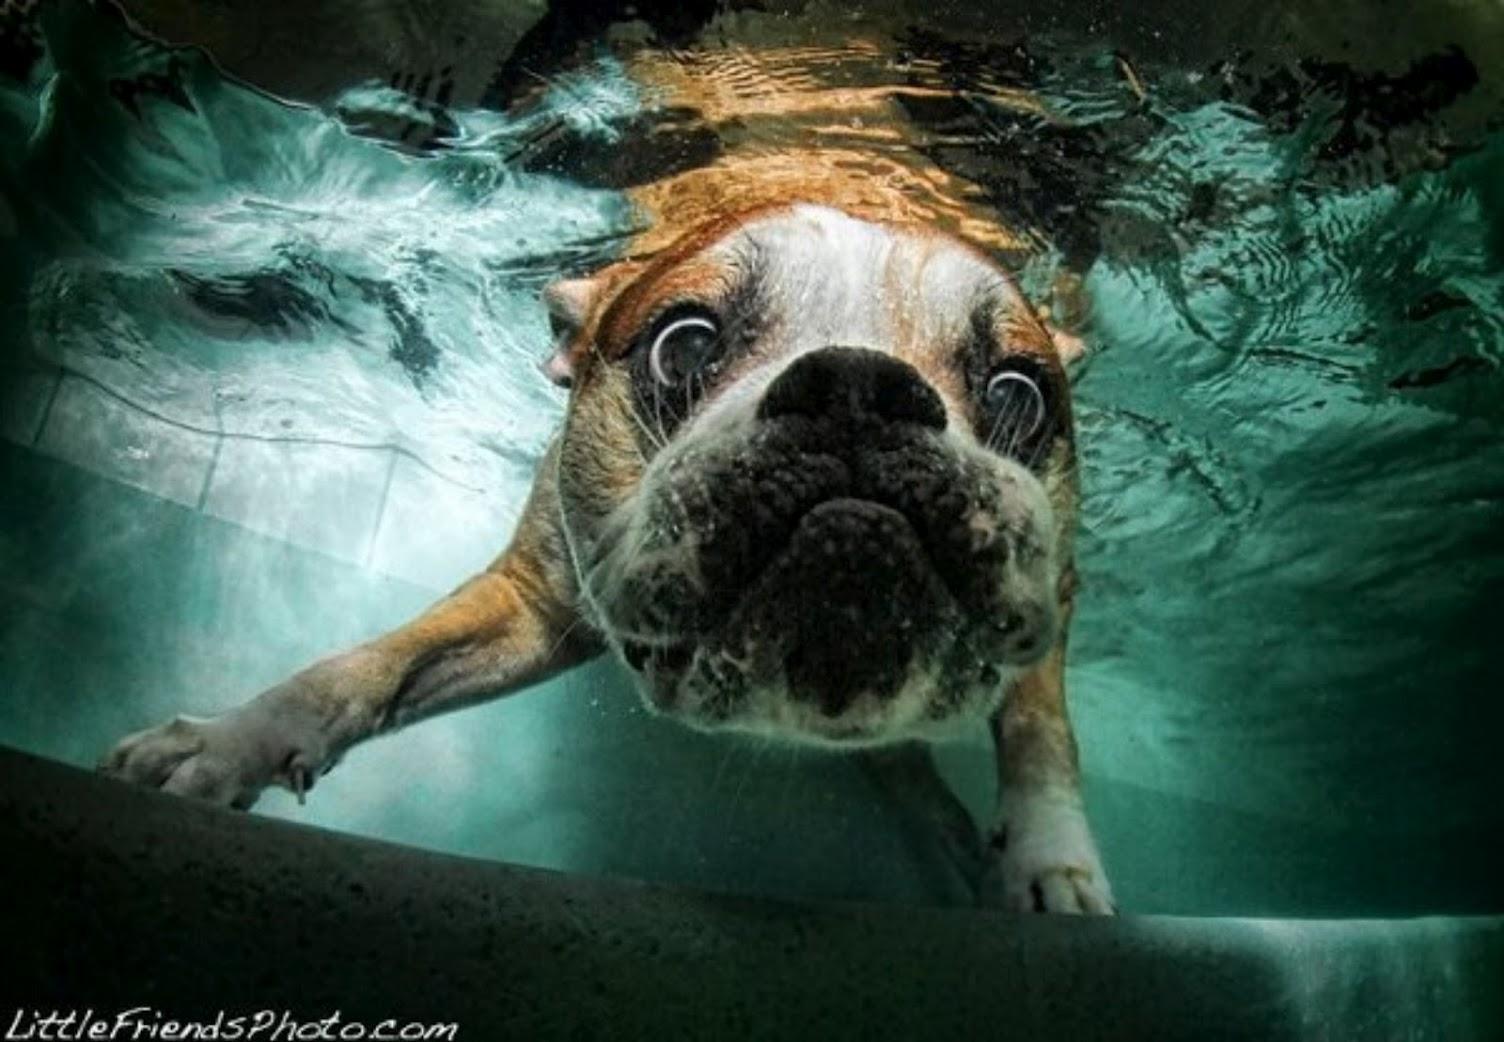 Seth Casteel's Underwater Dogs 1